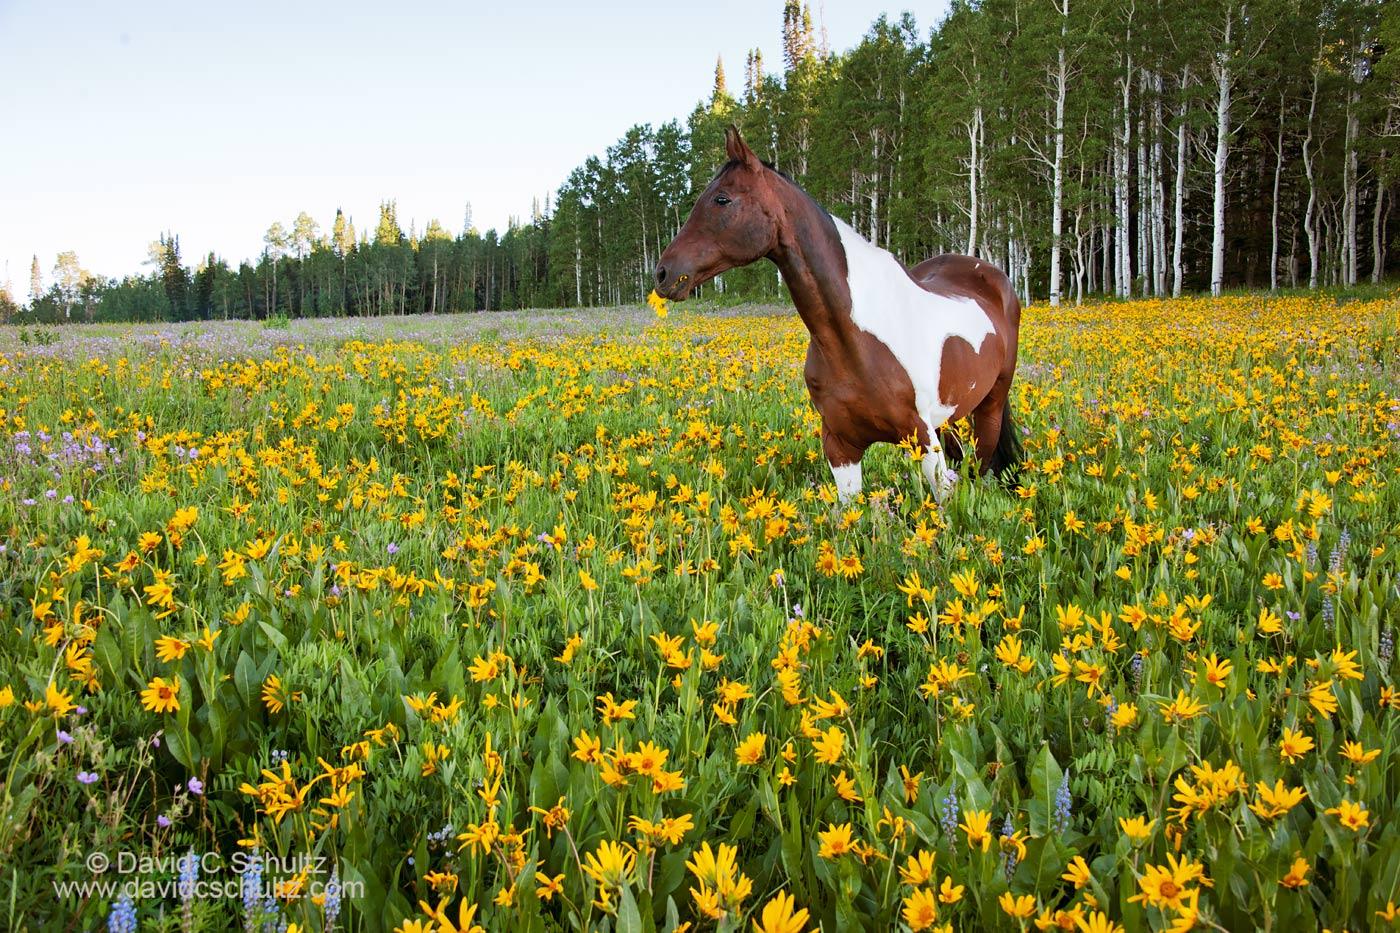 Horse in wildflowers in the Uinta Mountains, Utah - Image #47-831